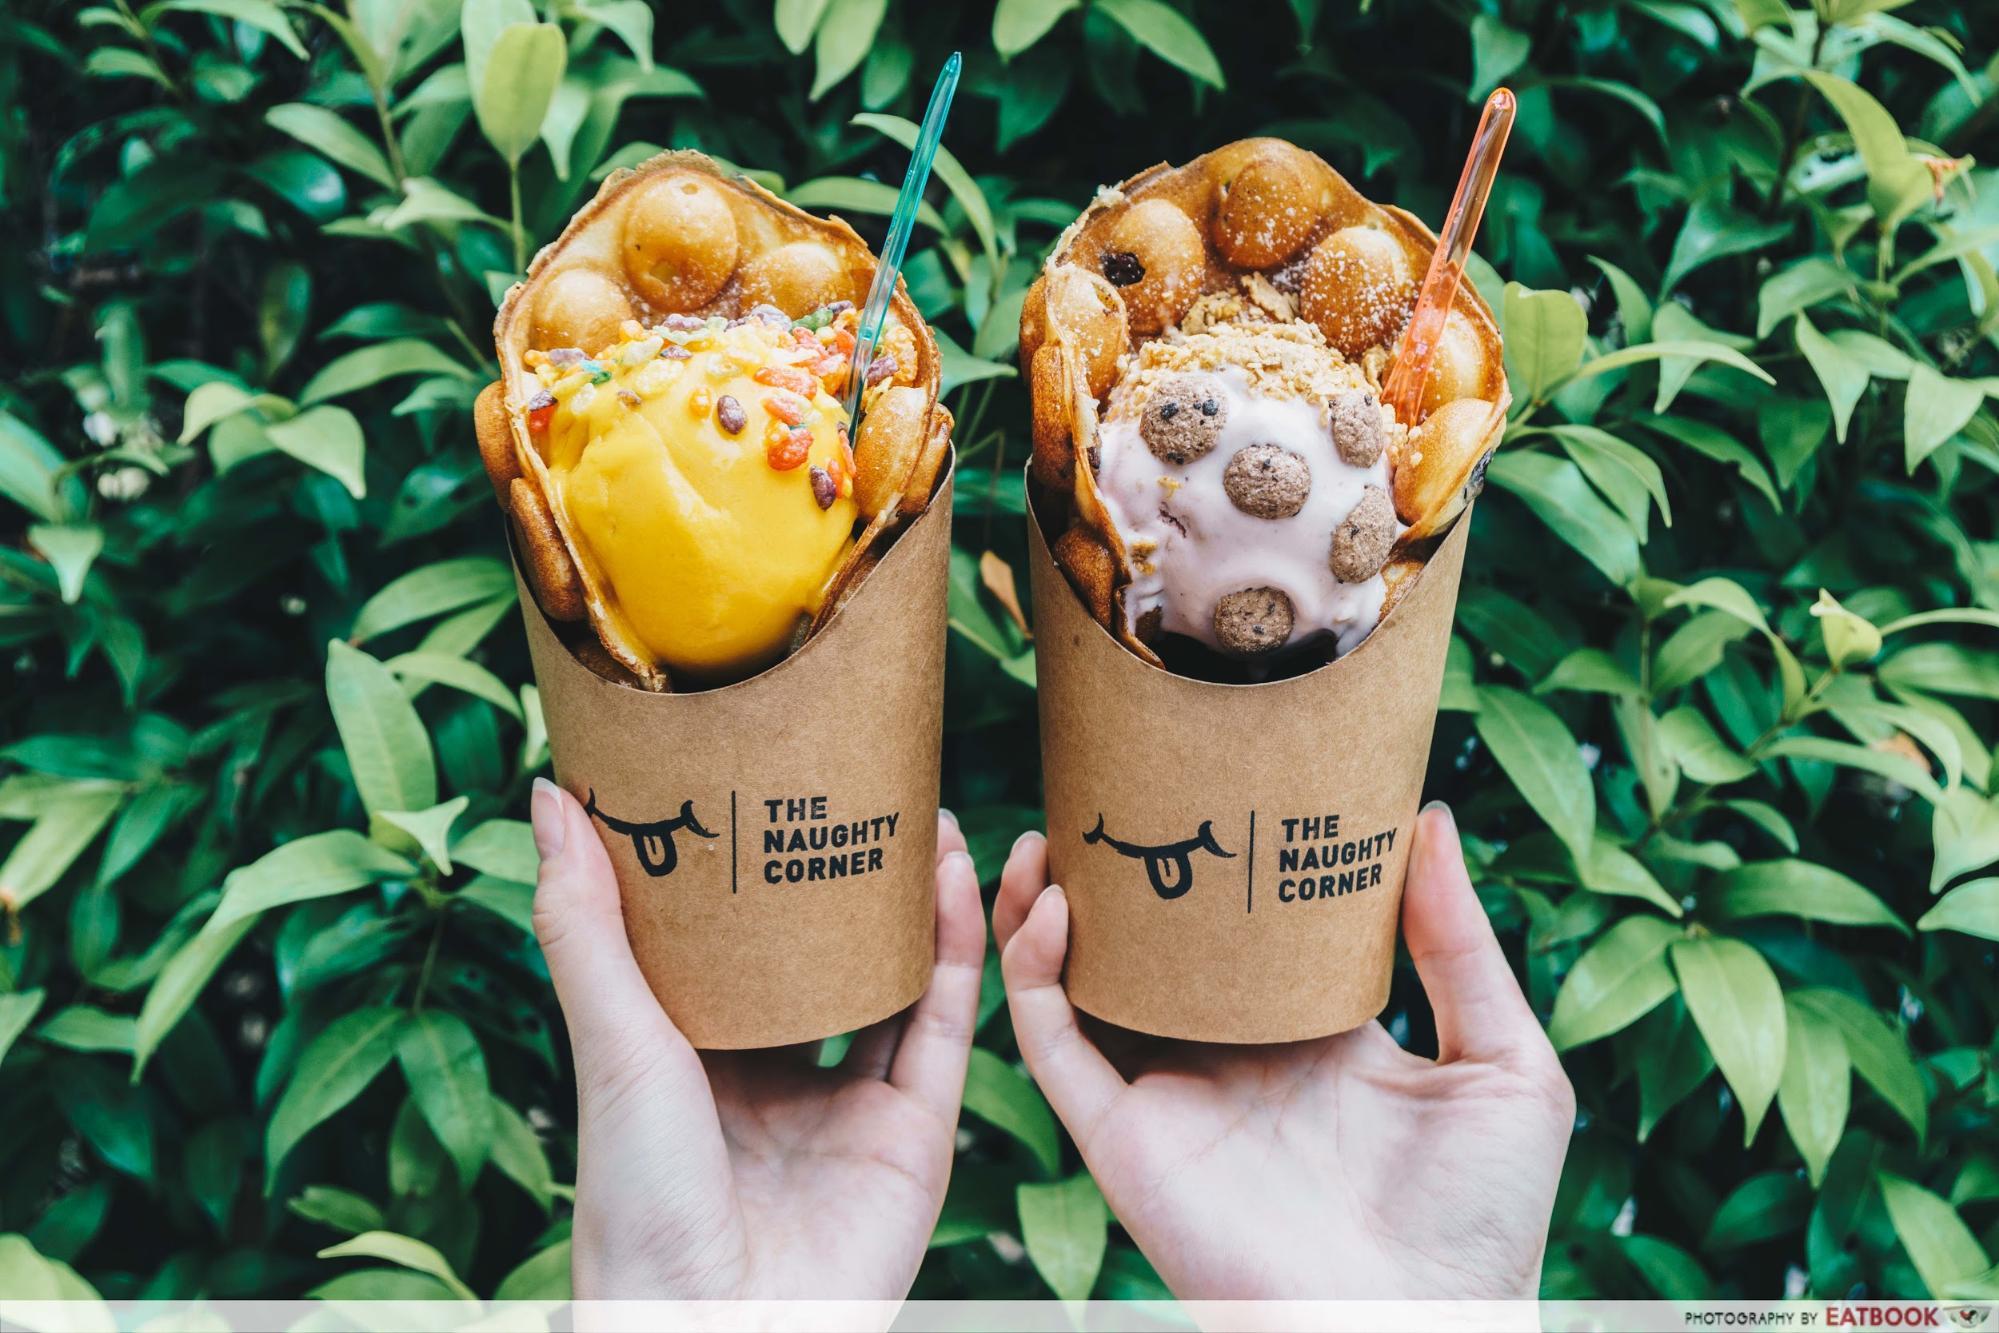 Eatbox 2020 - The Naughty Corner